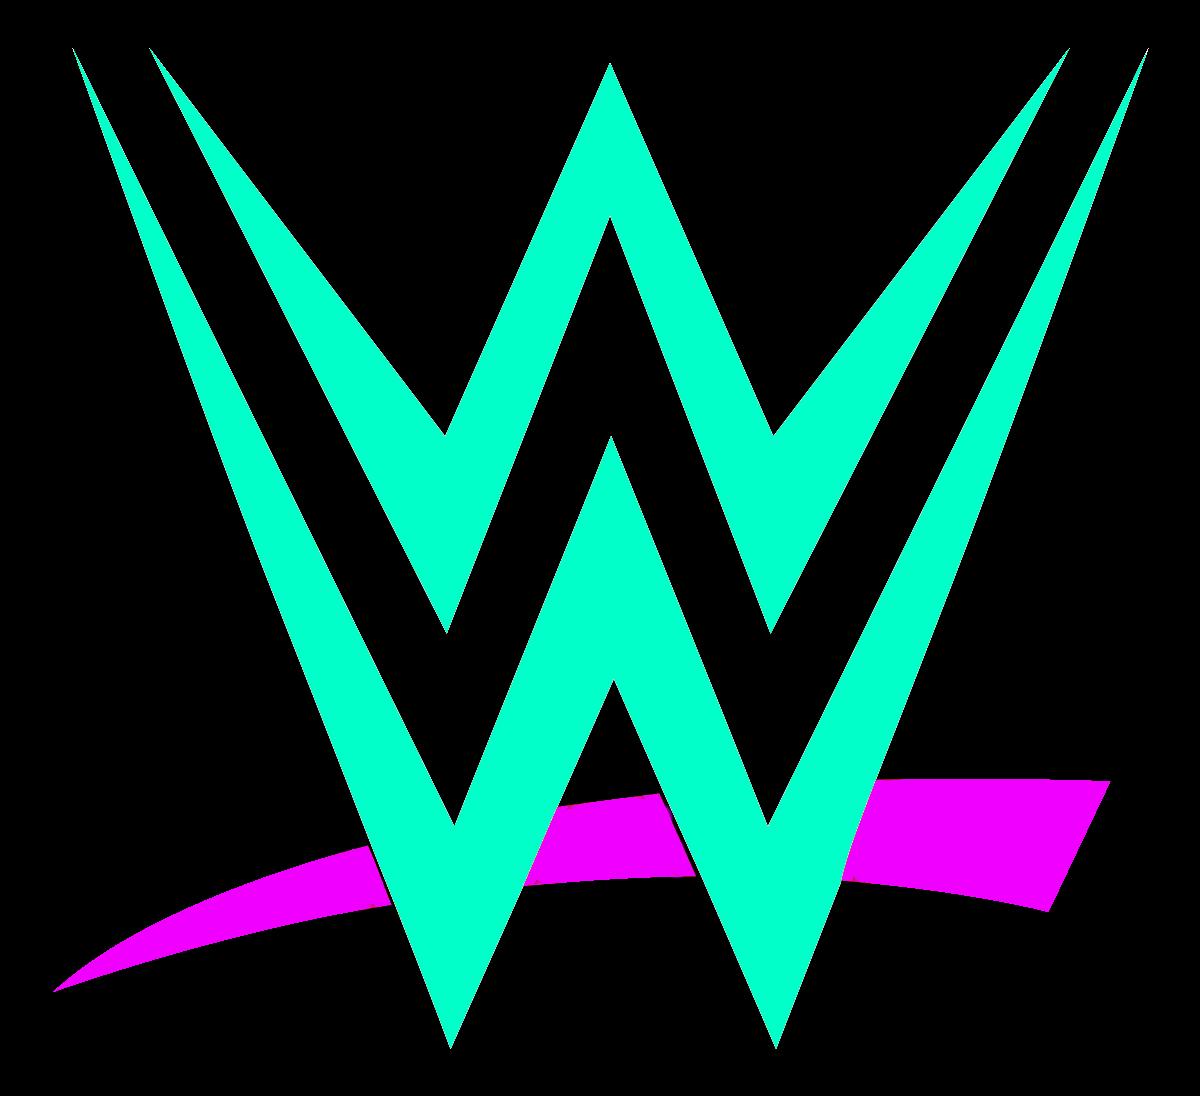 Wwe Logo Wwe Logo Wwe Wwe Highlights